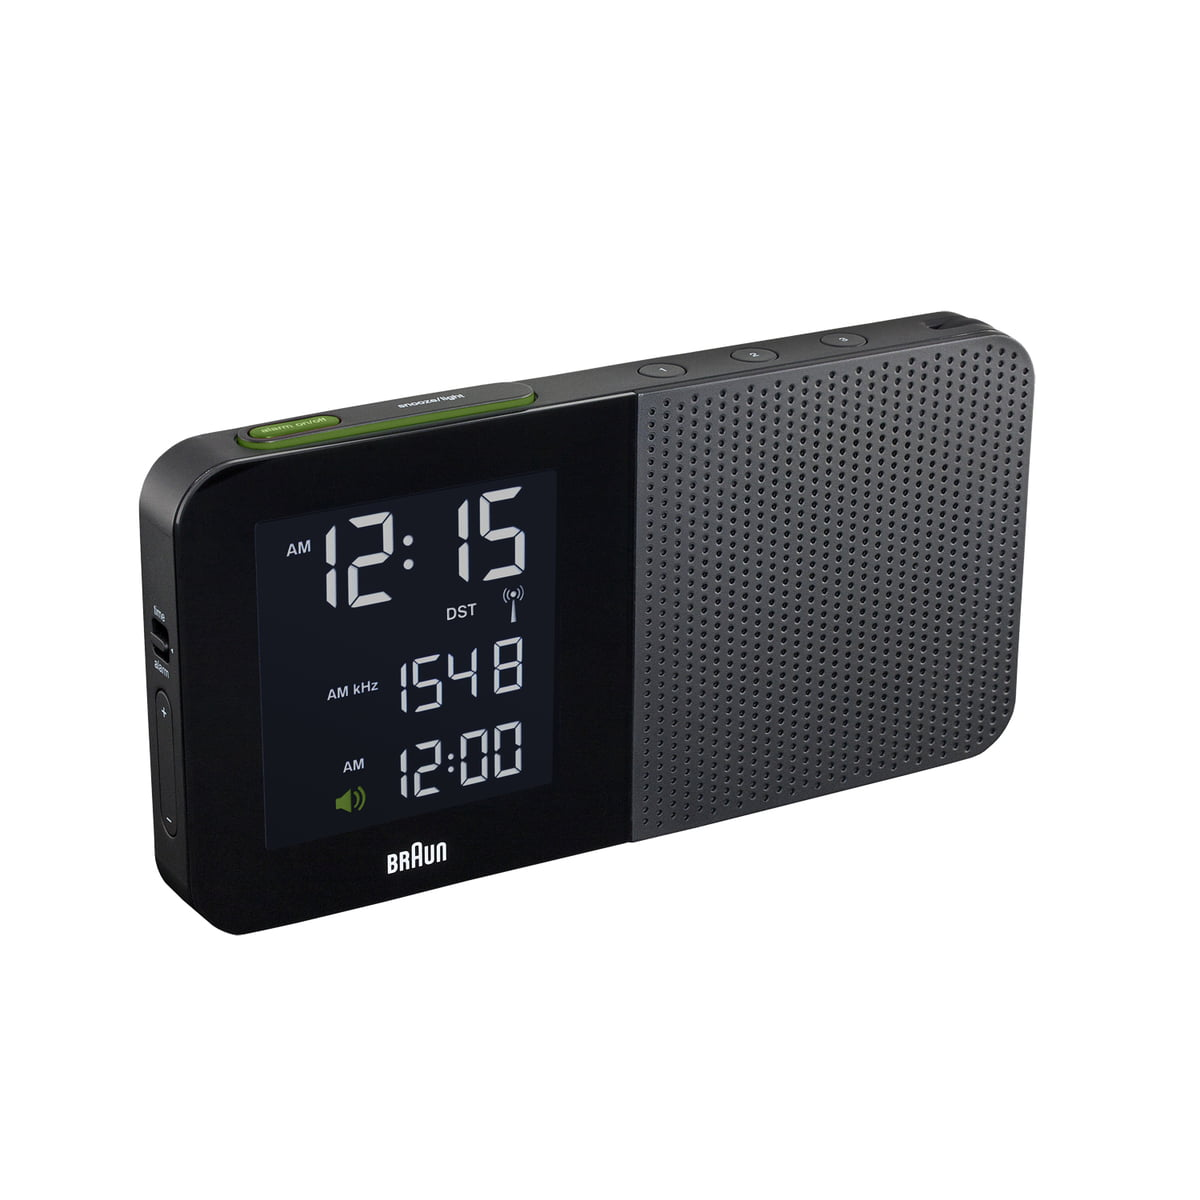 Digitaler Radiowecker BNC010, schwarz